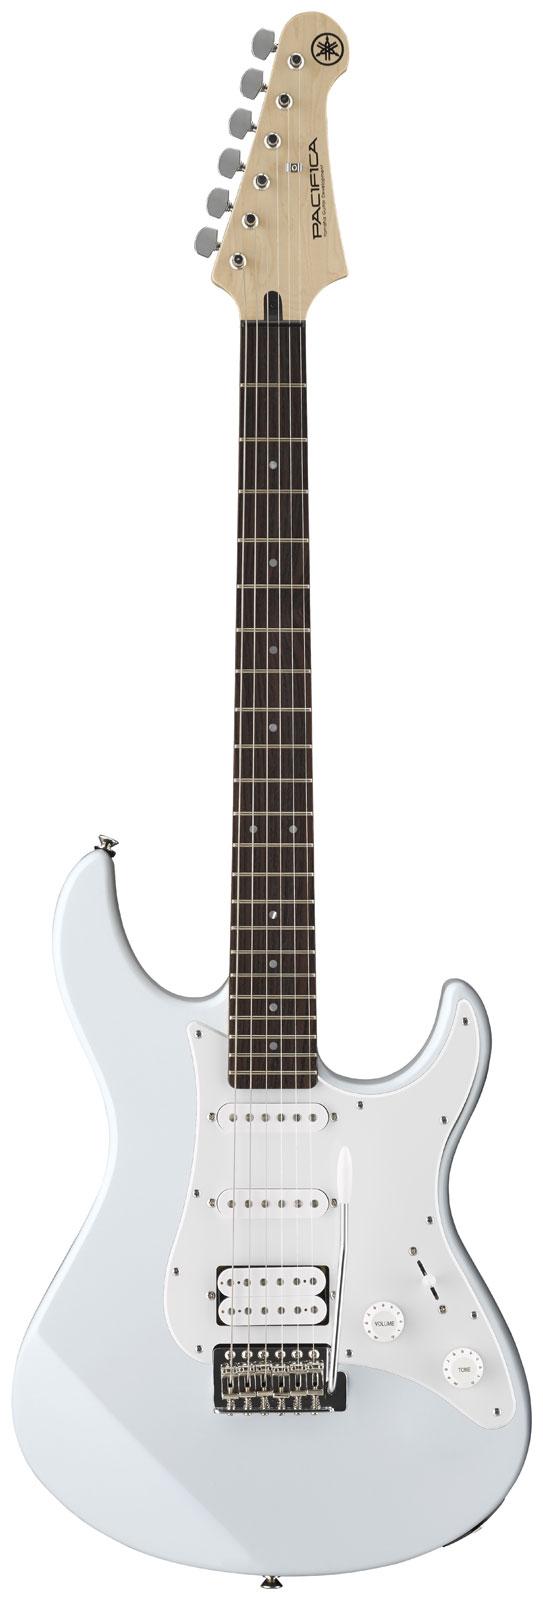 Yamaha Pa012vw Vintage White